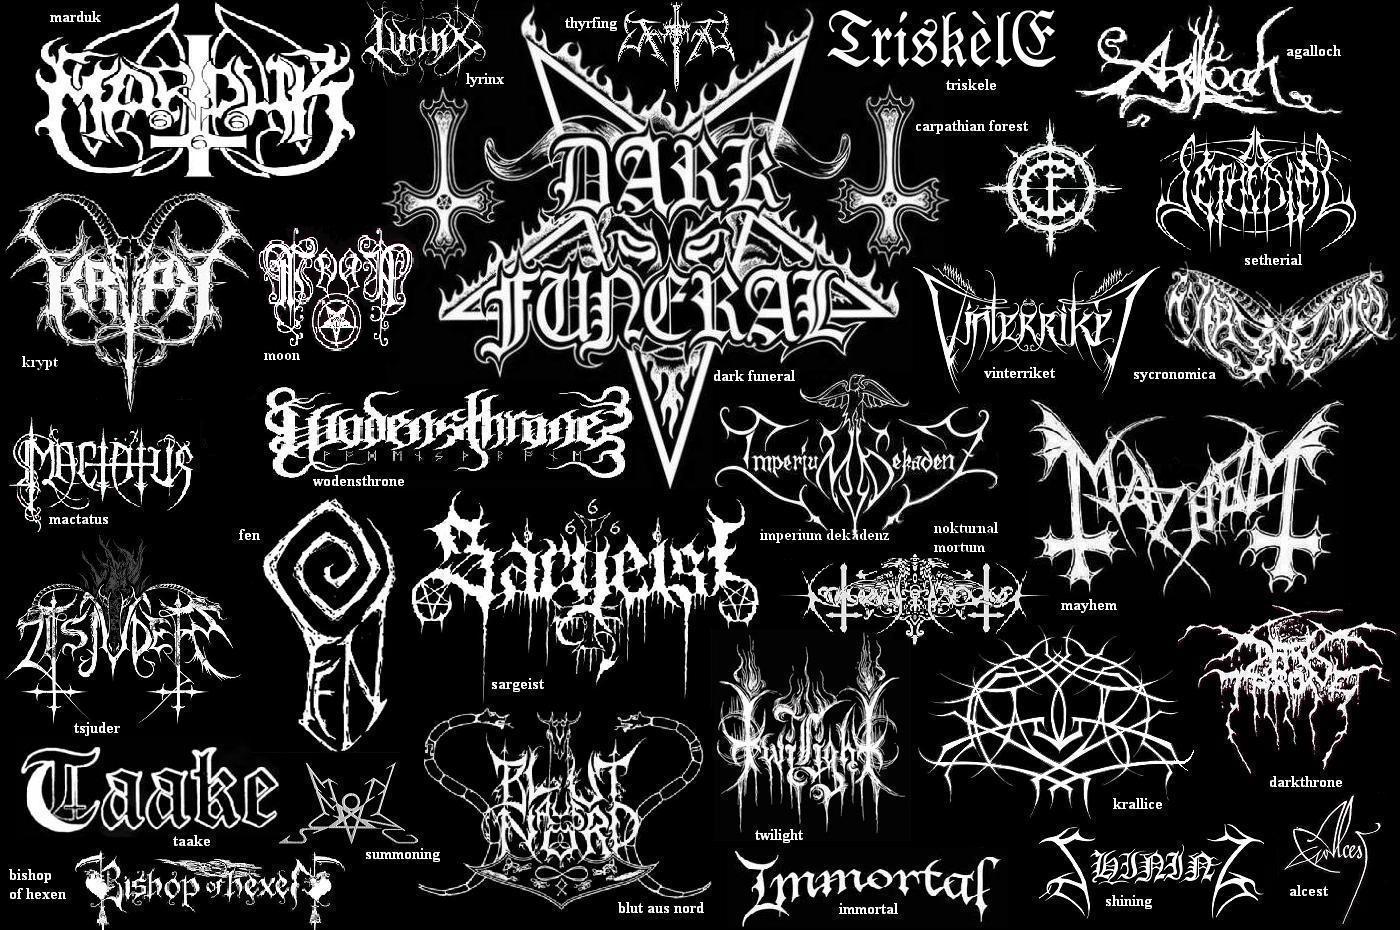 illegible black metal logo - photo #13